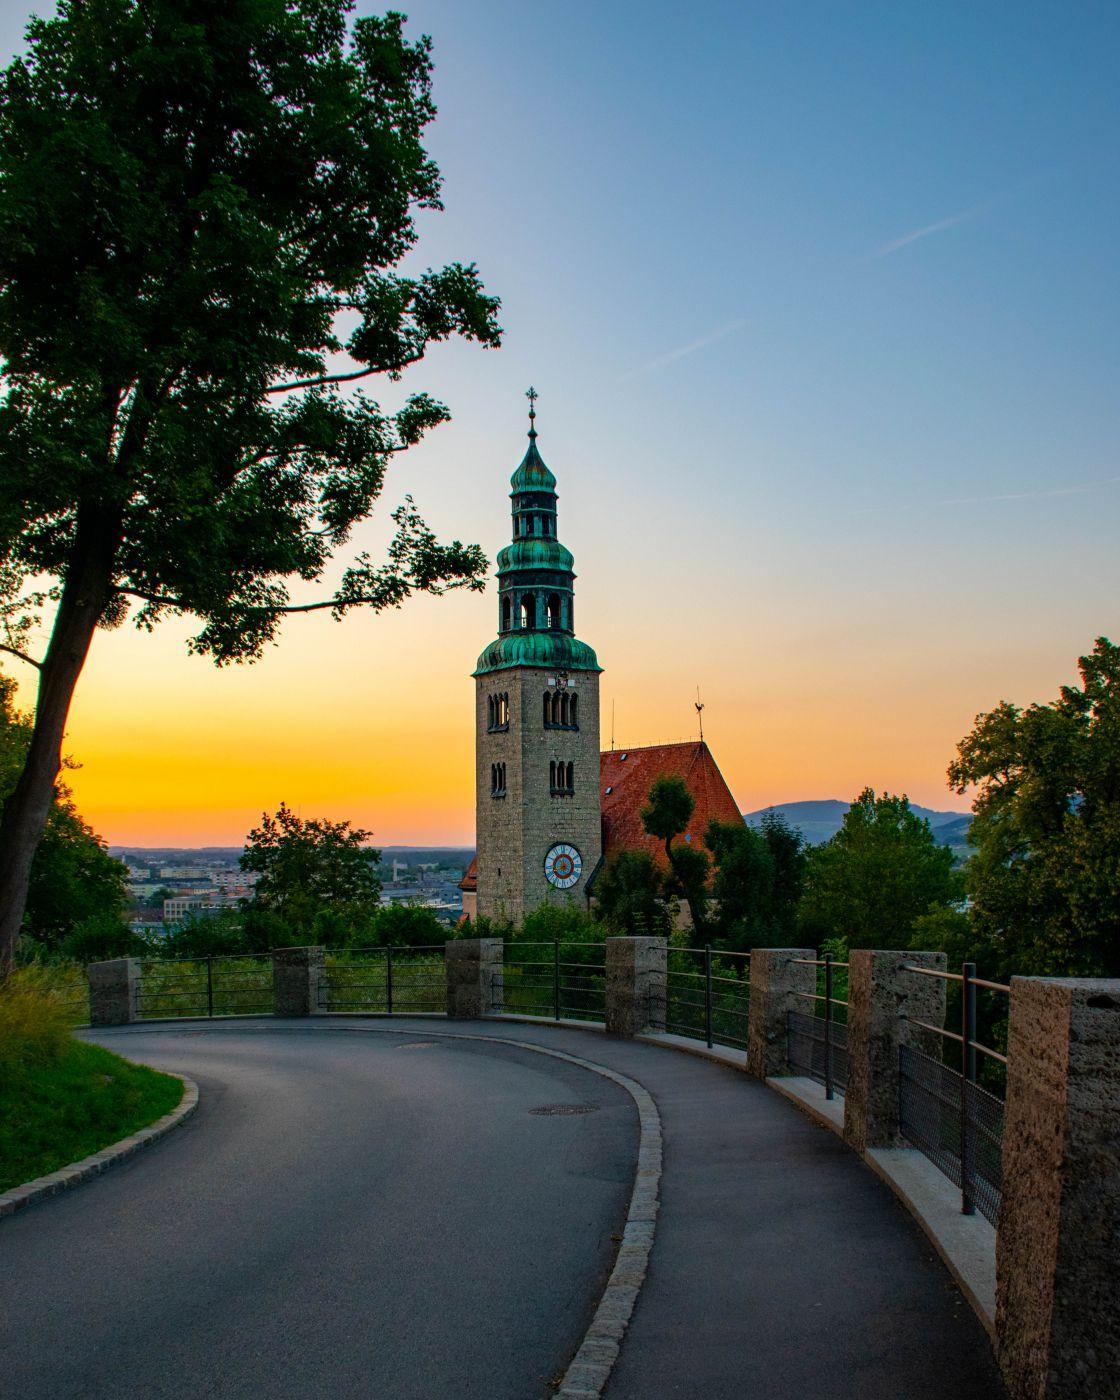 Sunset church, Salzburg (Pfarre Mülln), Austria